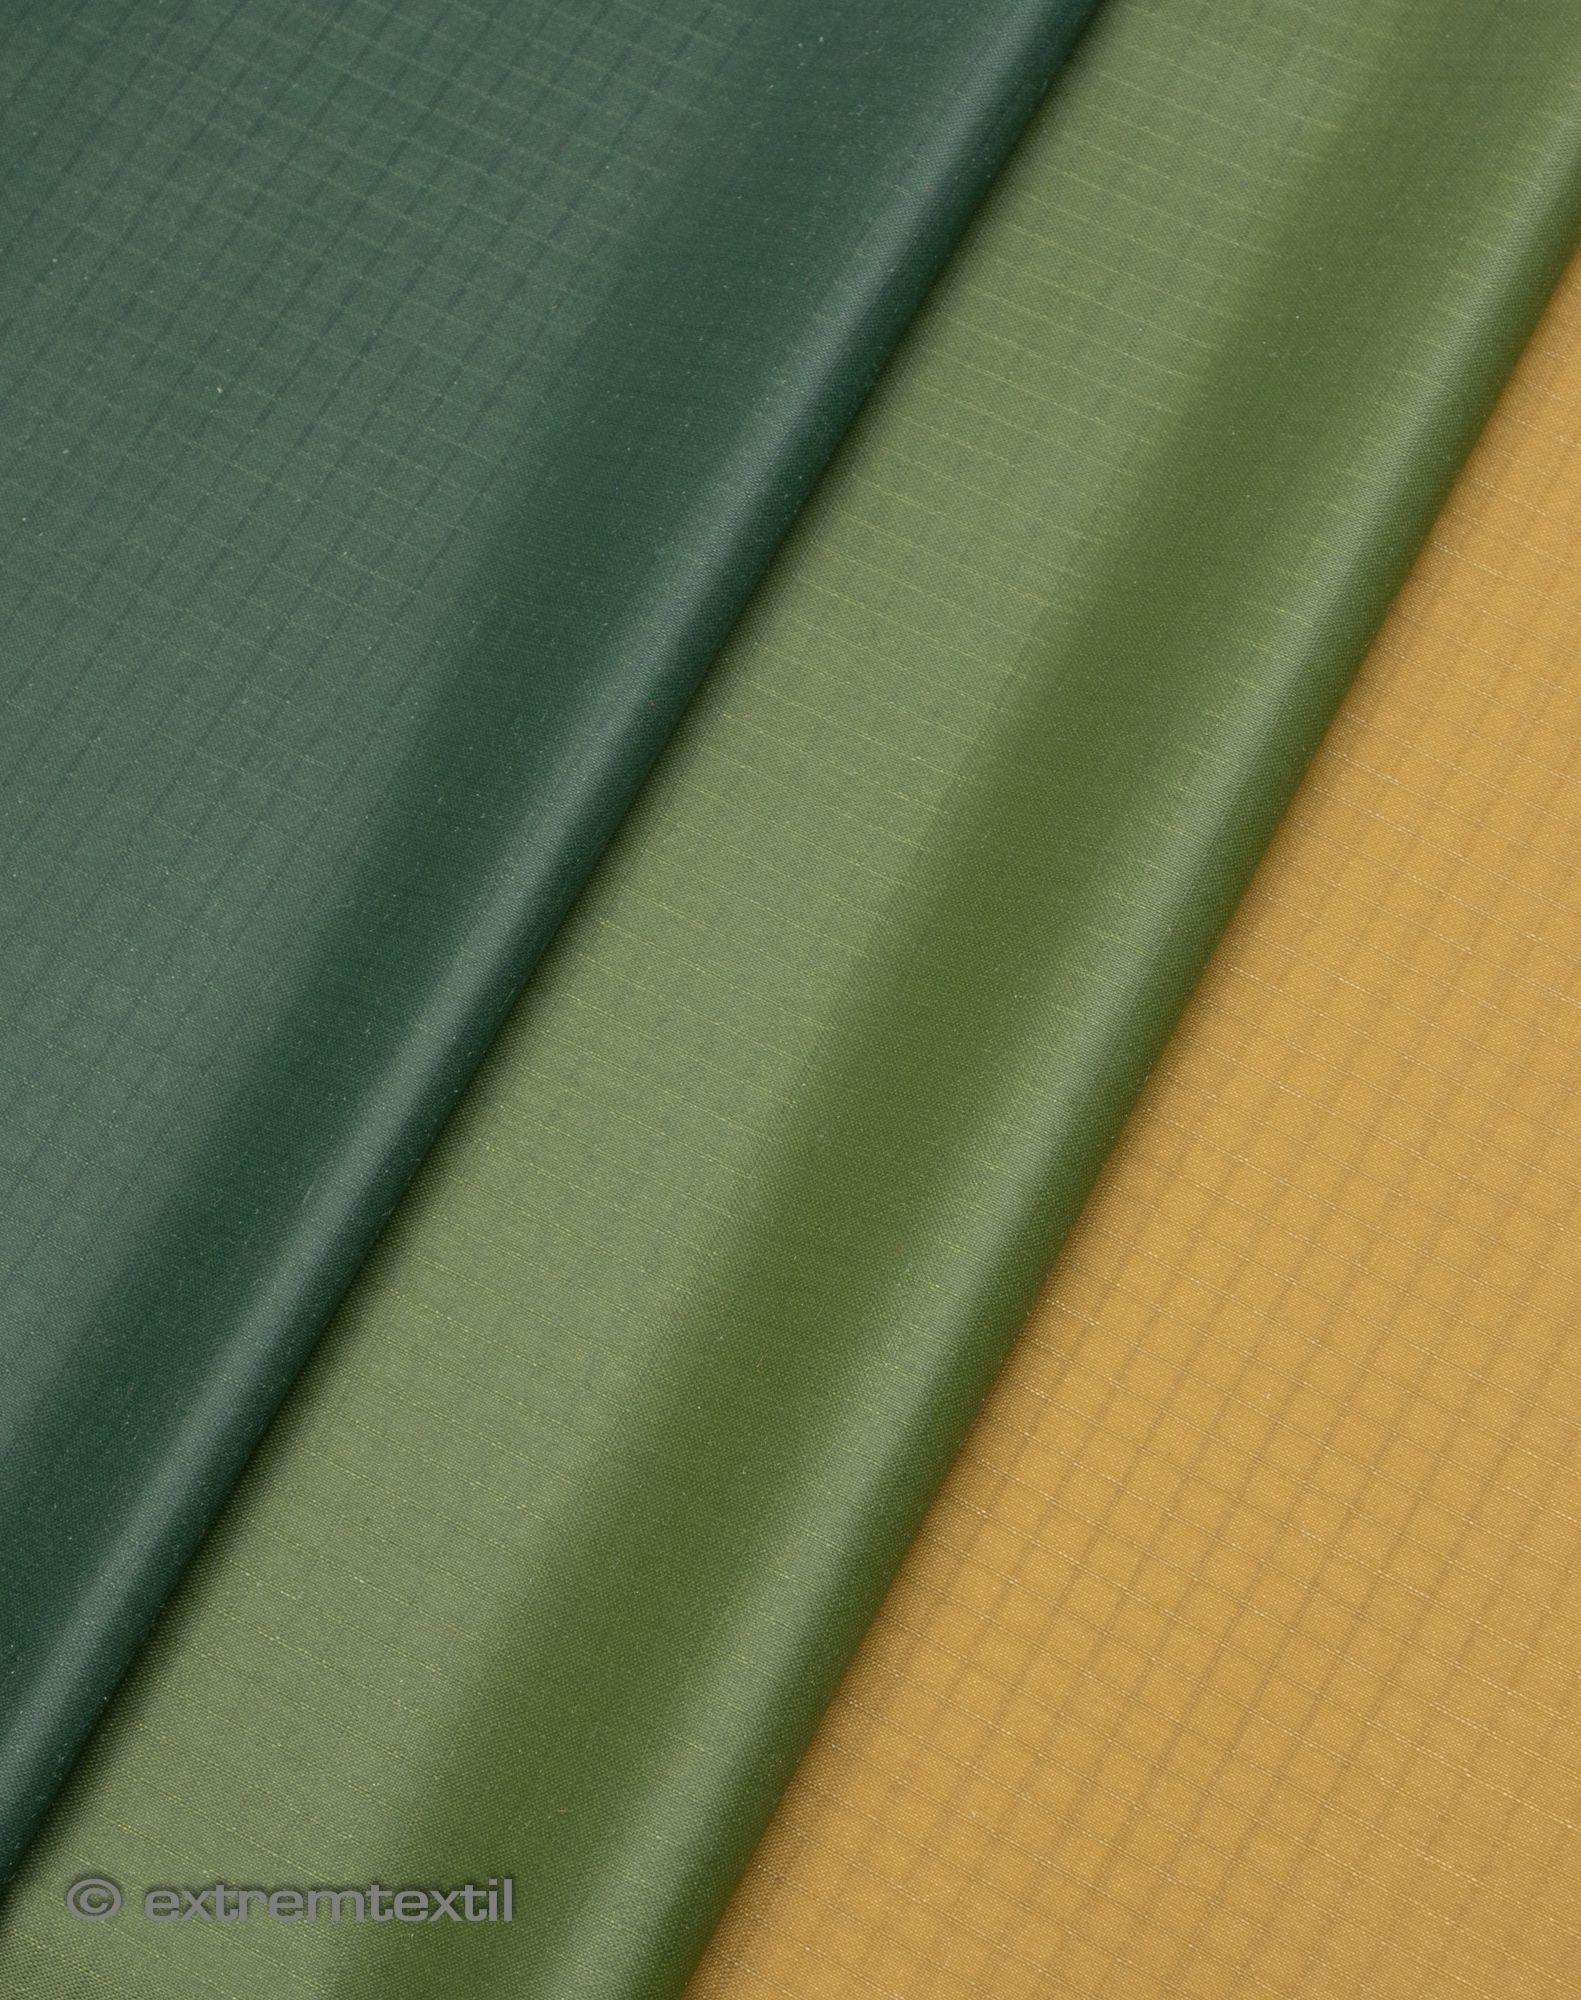 Ripstop Nylon tentfabric silicone coated 40den 55g/sqm & Ripstop Nylon tentfabric silicone coated 40den 55g/sqm | steamer ...